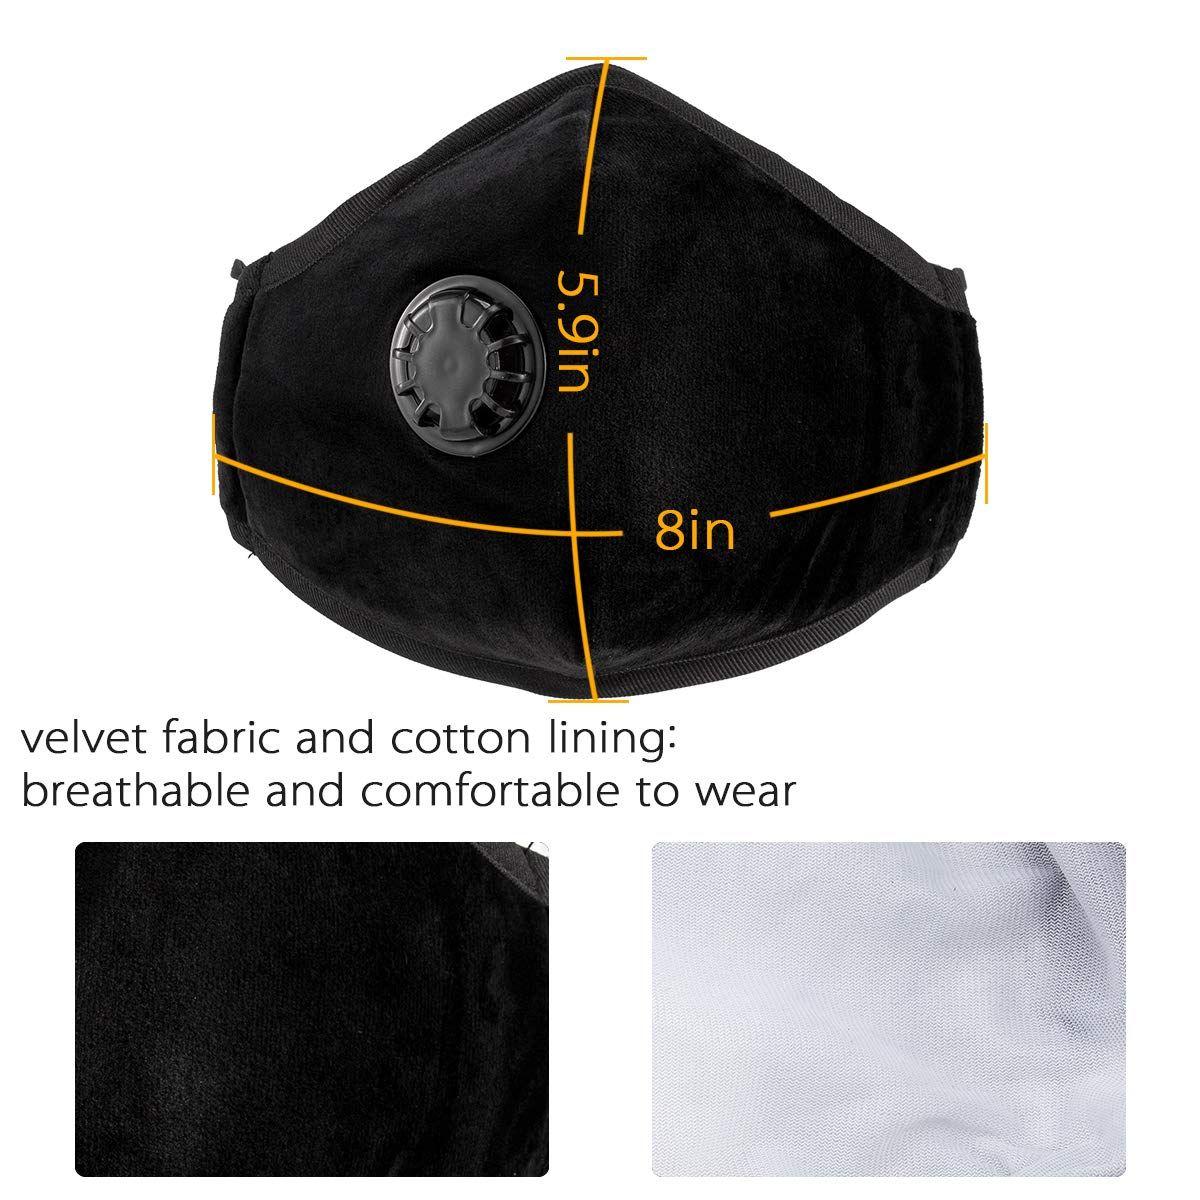 n95 respirator mask 8 filters